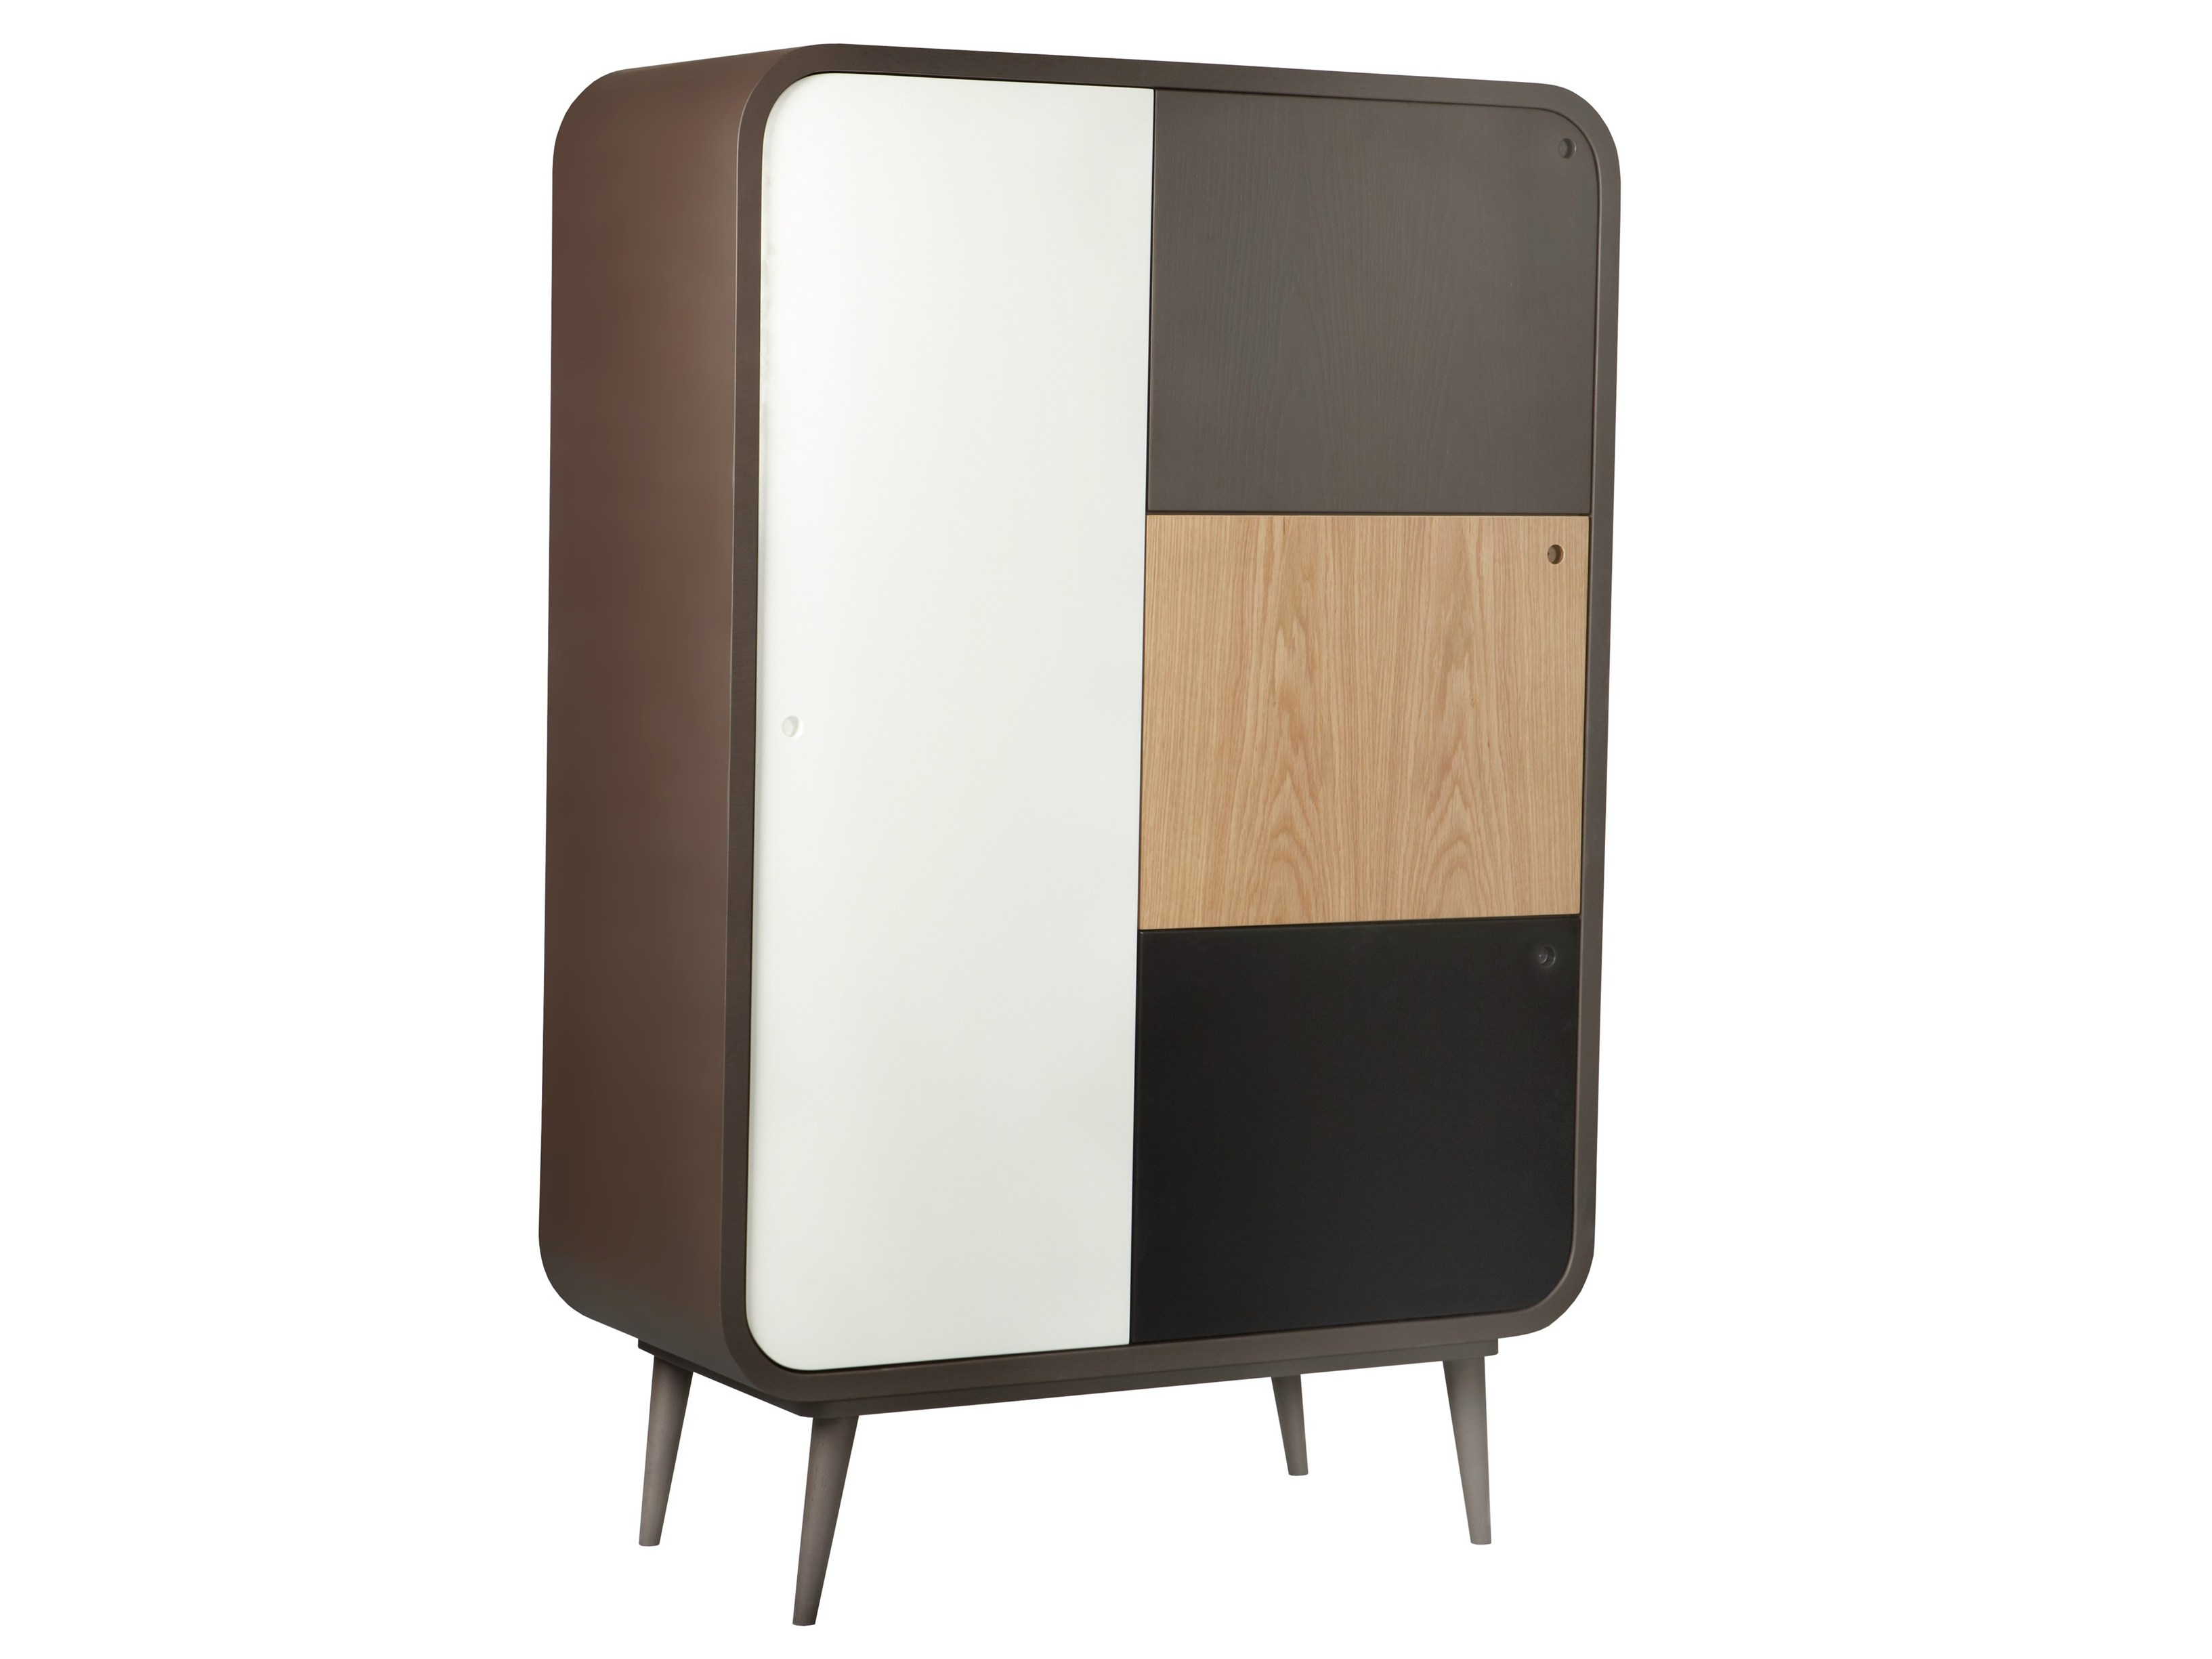 vaisselier avec portes mylo by azea design victor caetano. Black Bedroom Furniture Sets. Home Design Ideas